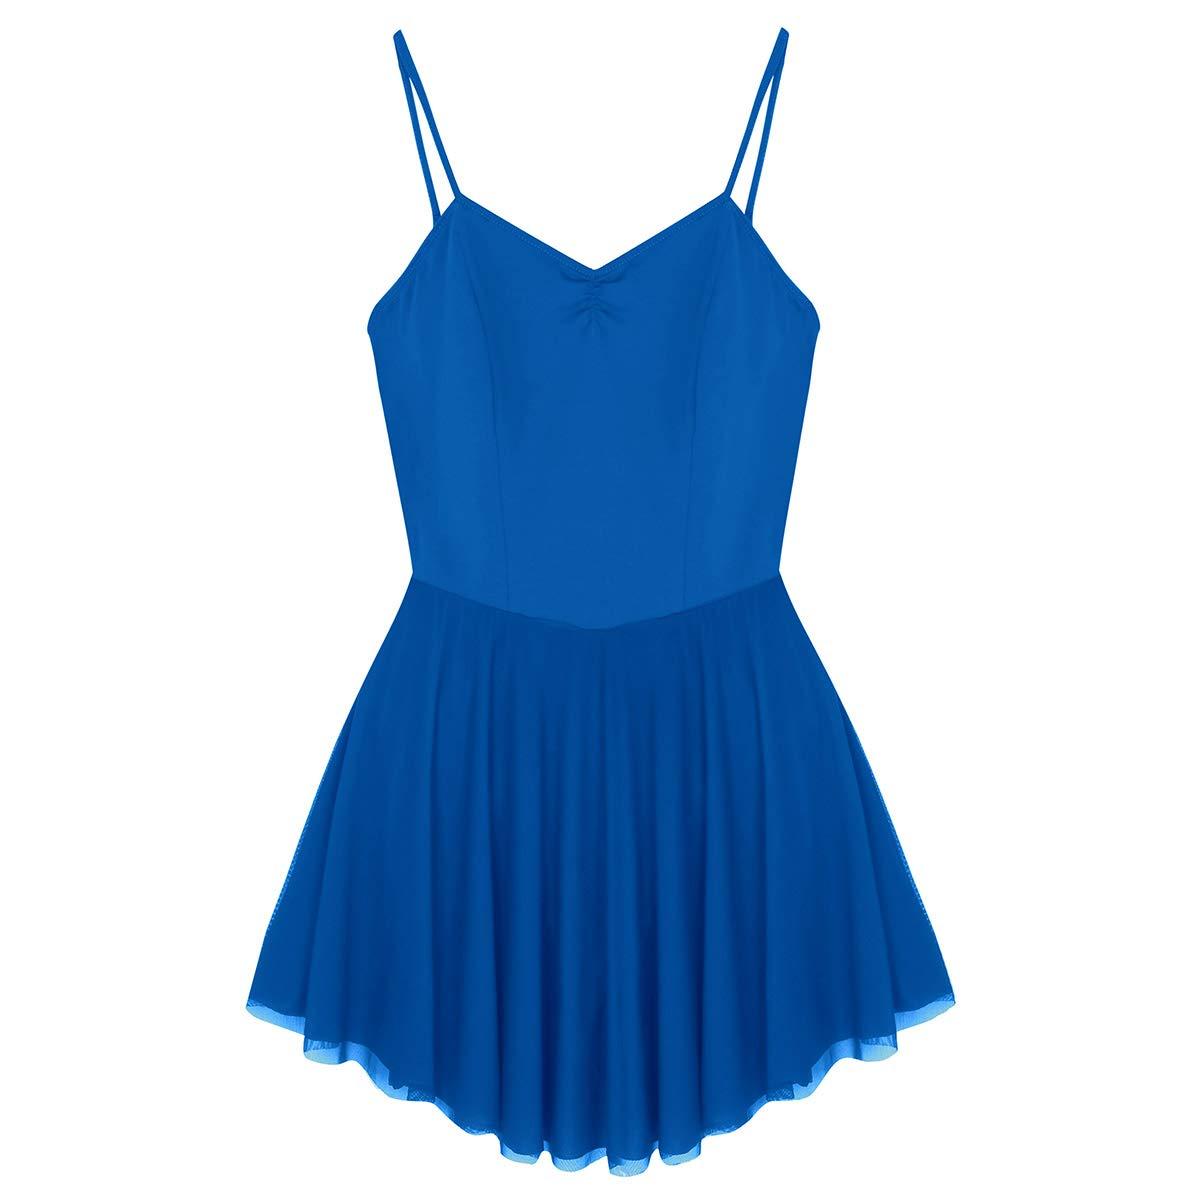 YiZYiF Traje de Tirantes Danza Ballet para Mujer Elegante Vestido con Tirantes de de Algodón Maillot Adulto para Gimnasia Ejercicio Actuación 9c366e